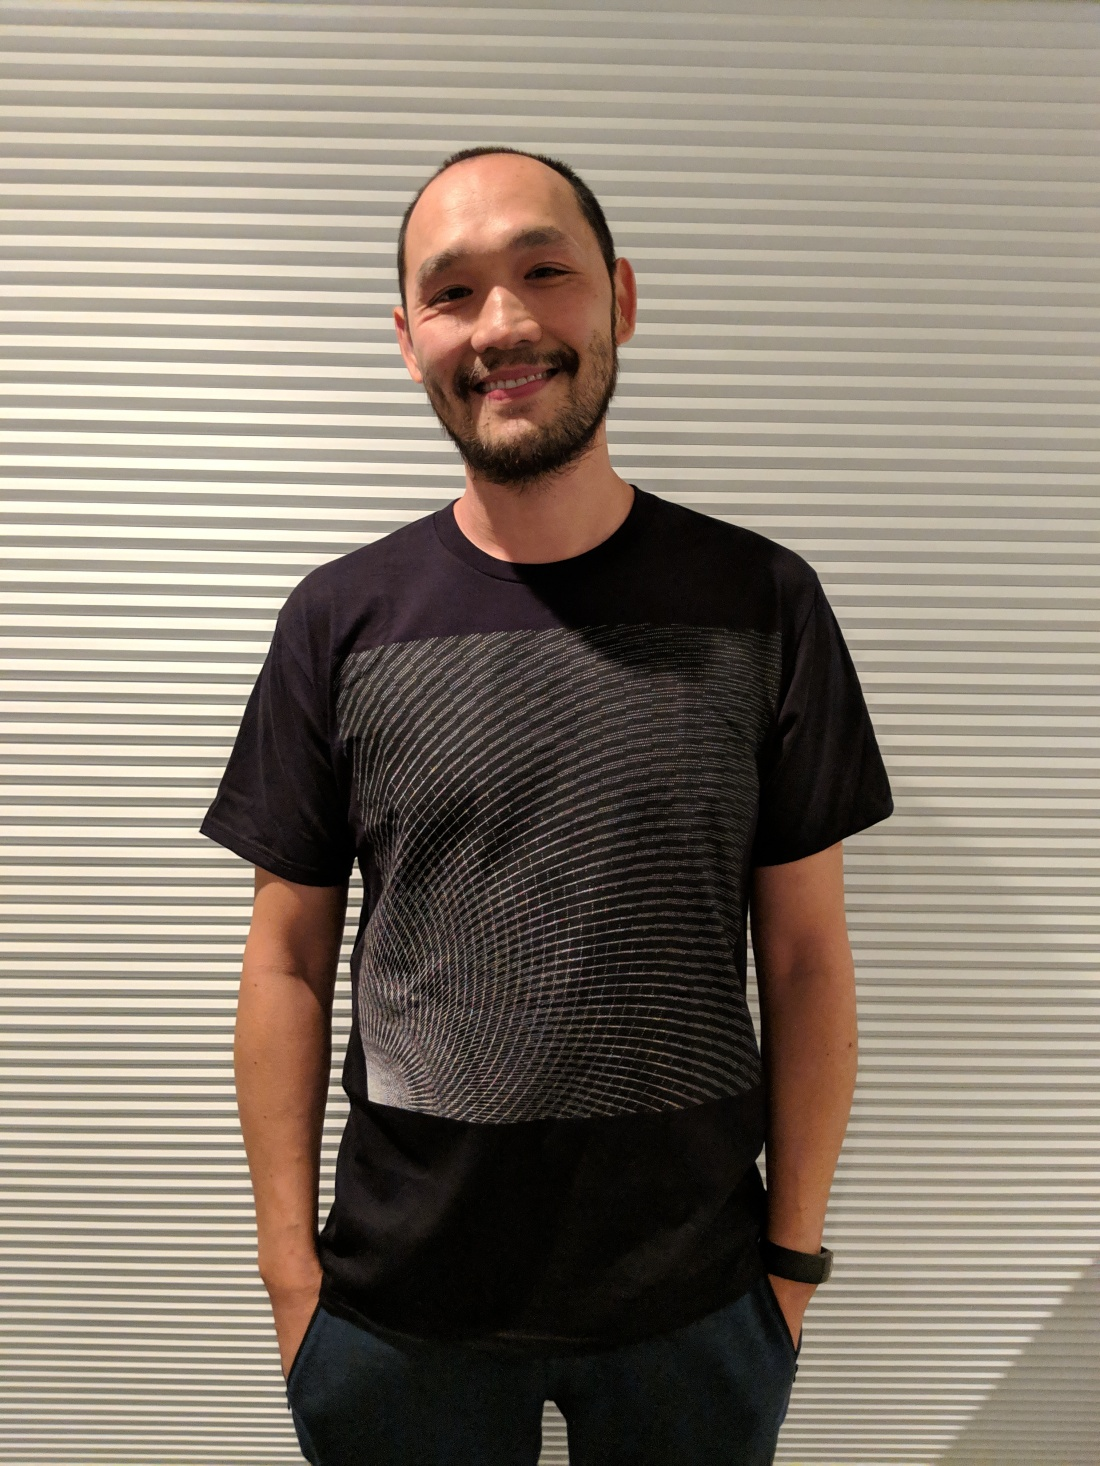 Ballio wearing his computational art shirt.